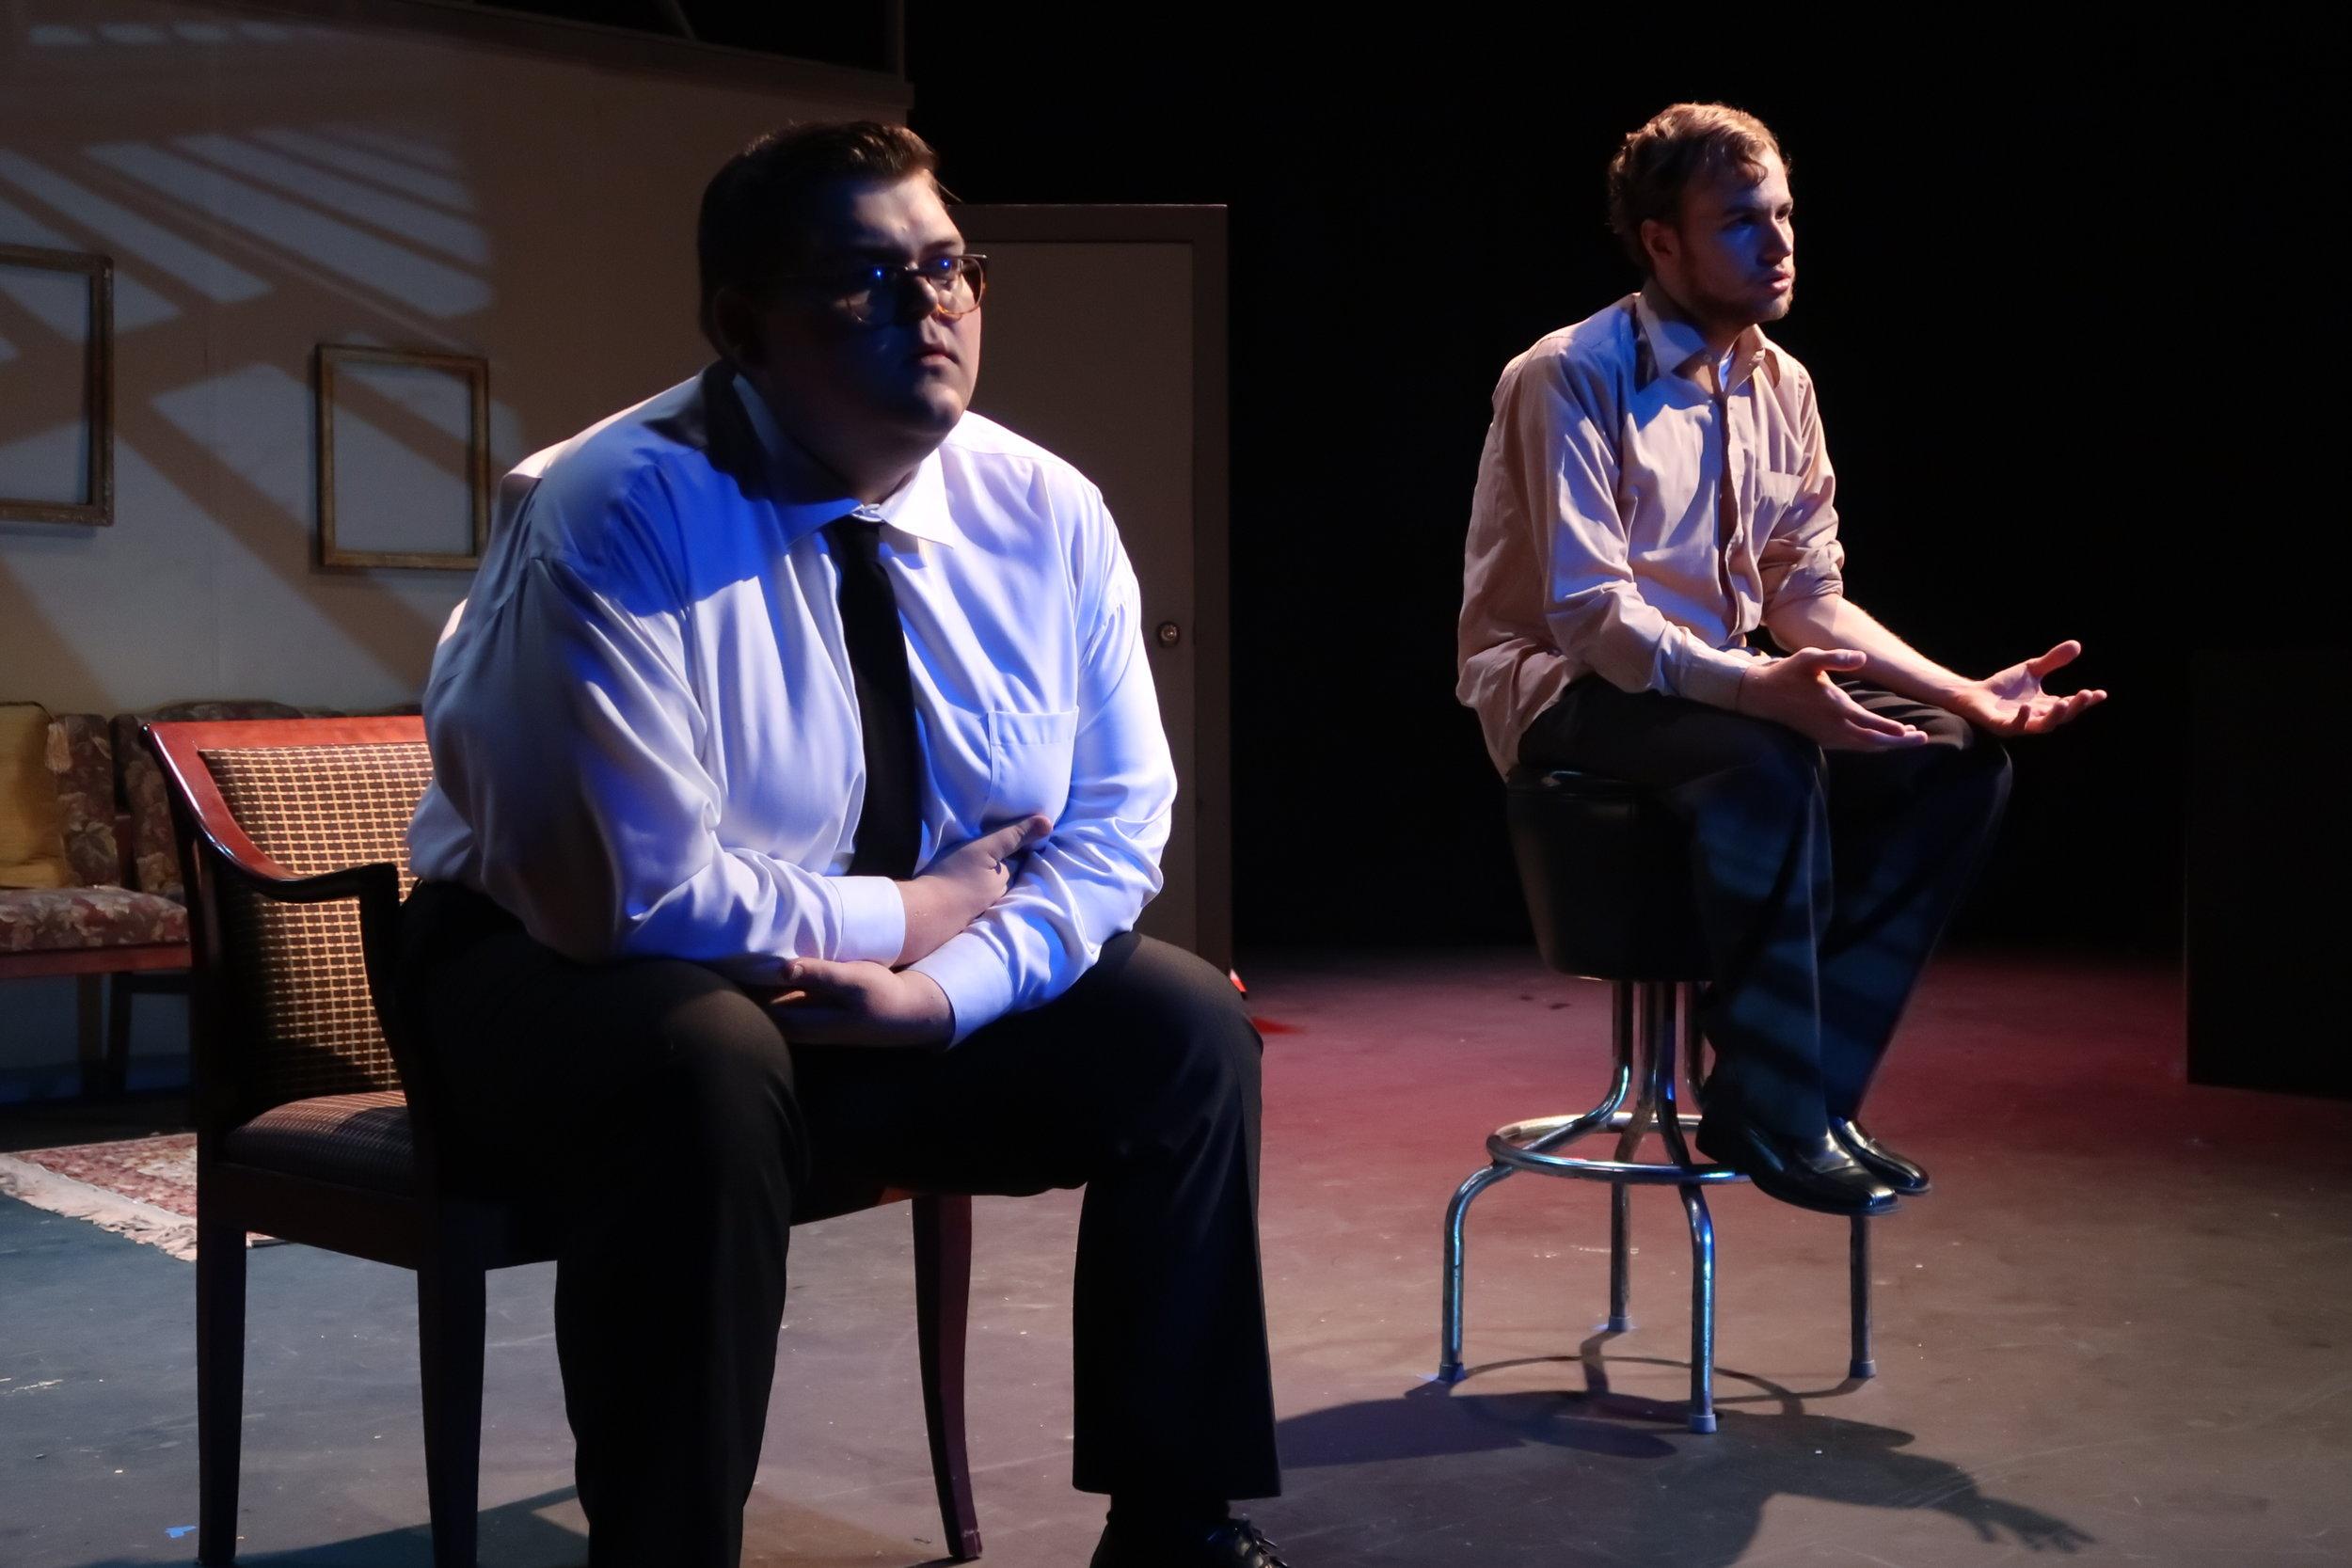 Marshall Hodges as Gene; David Verderame as Jonesy